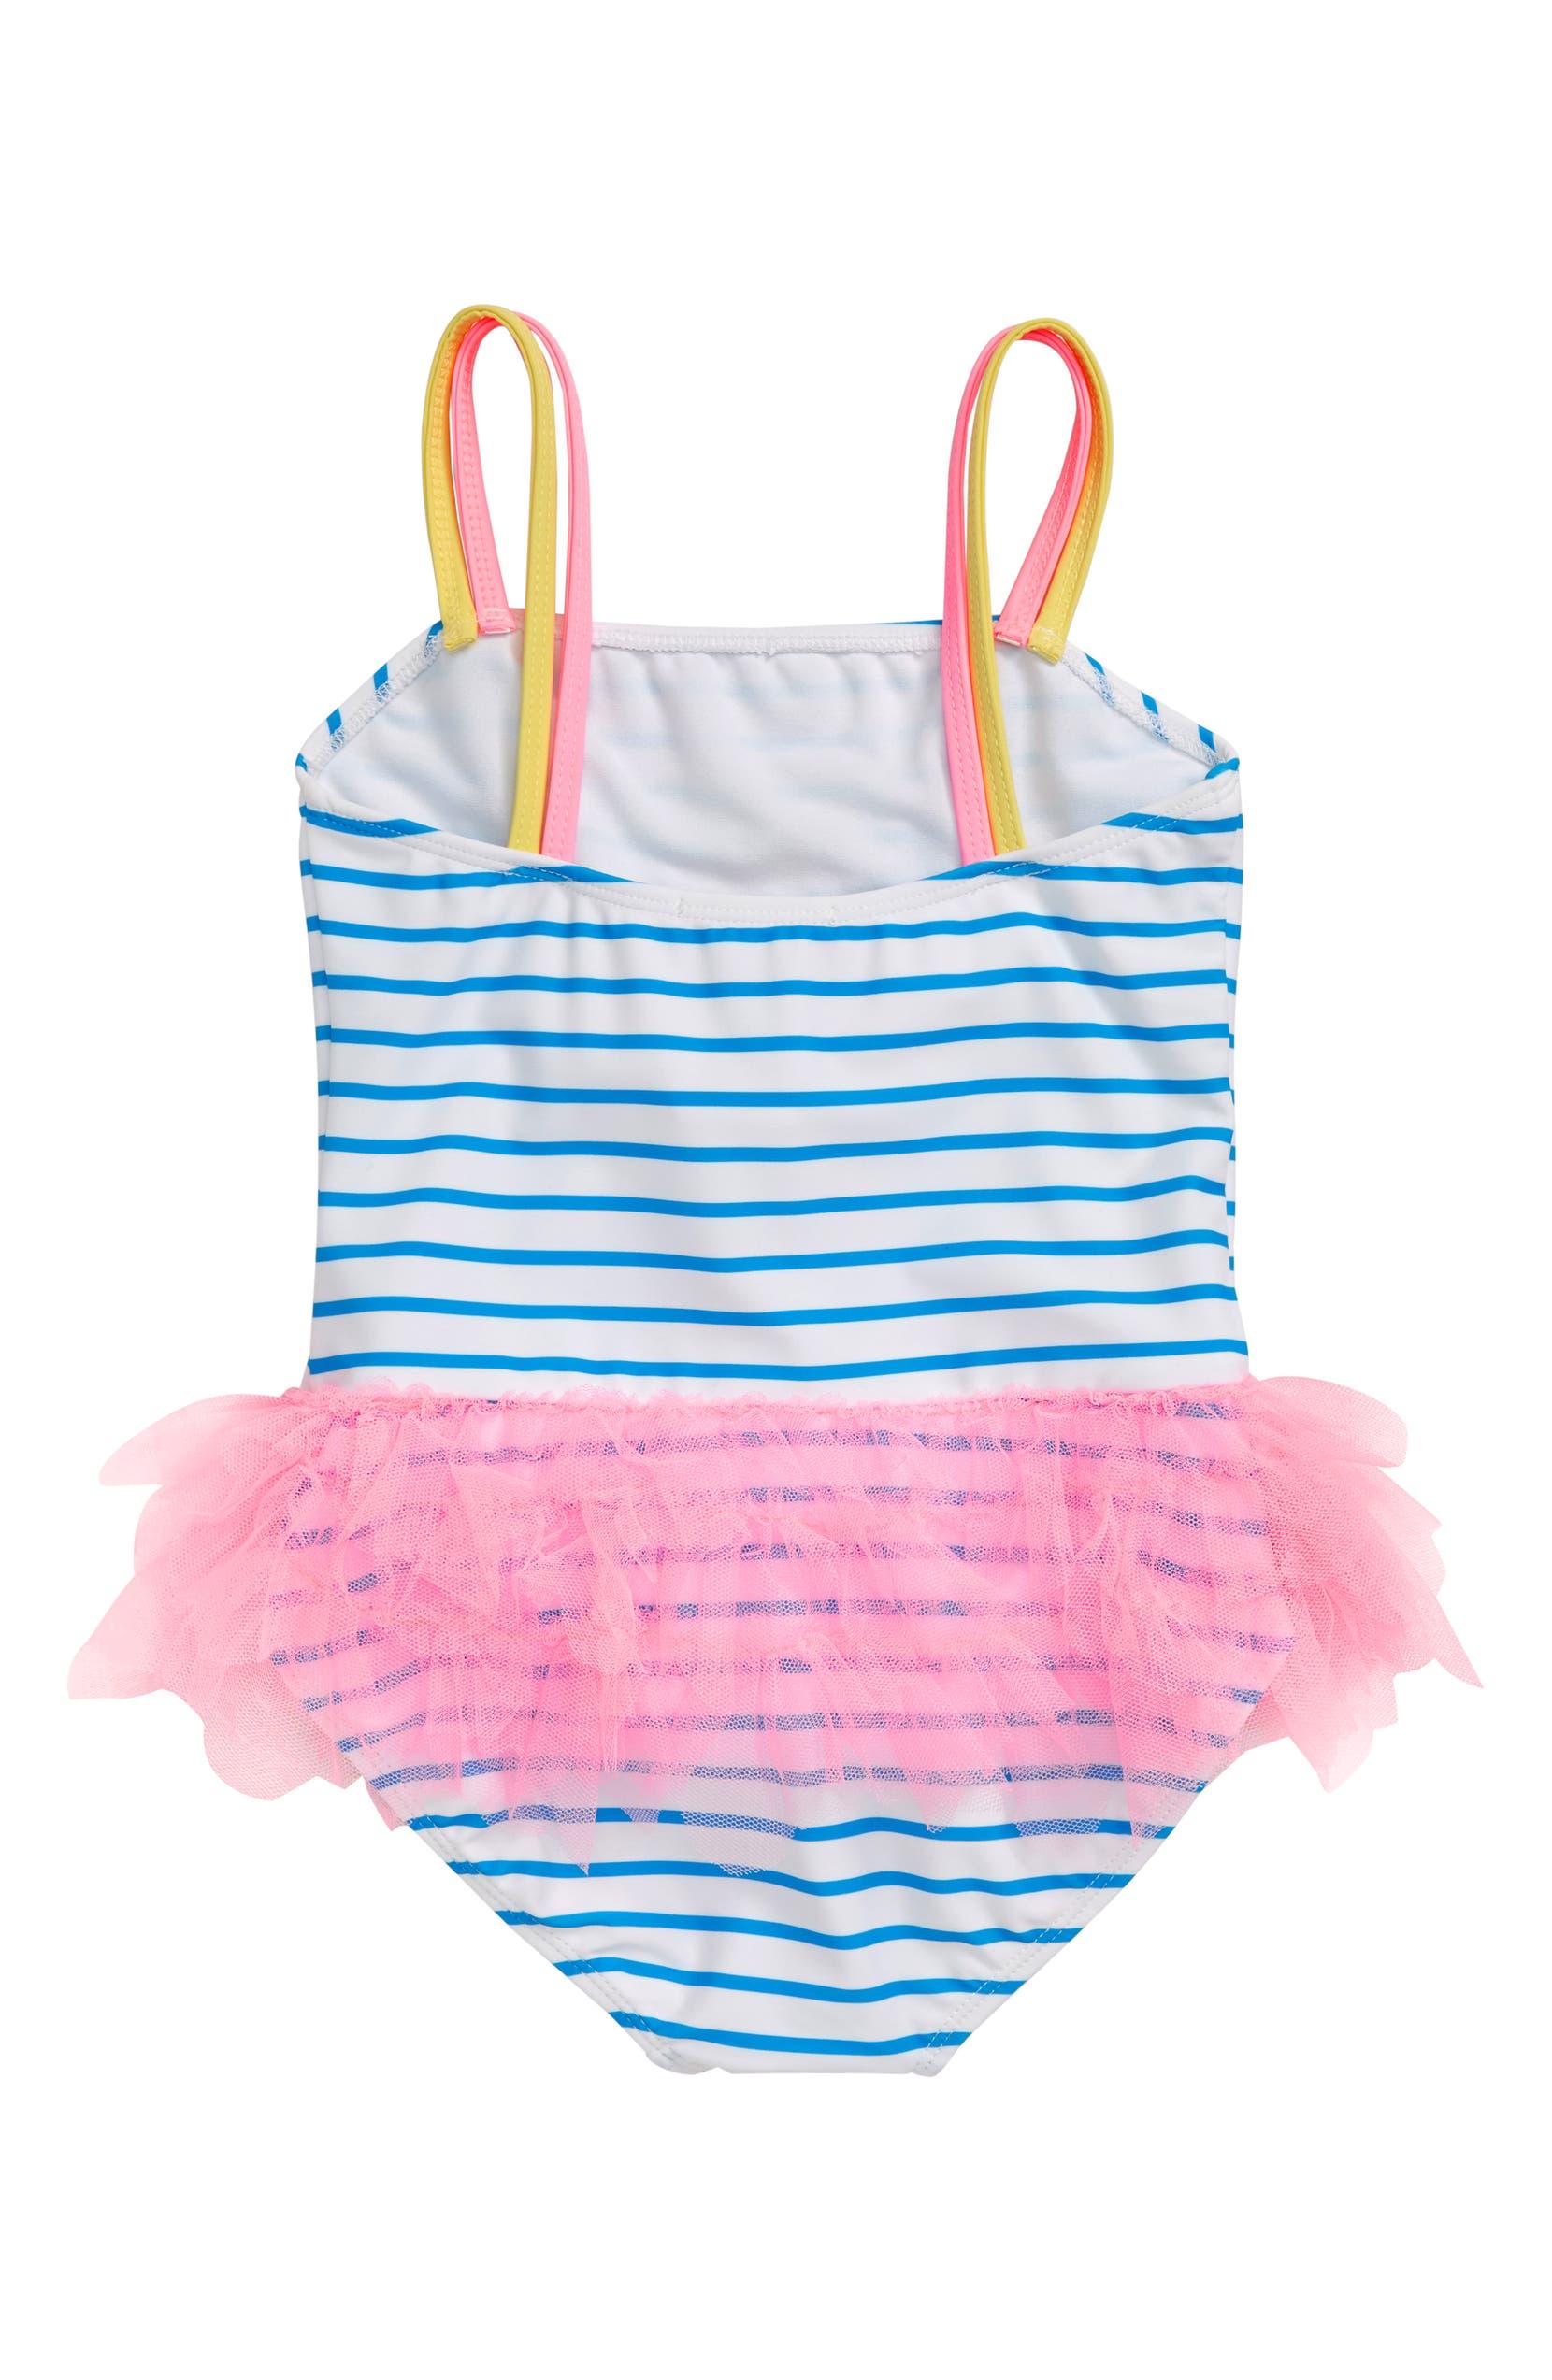 f85dc28b8faf2 Kate Mack Cherry Tutu One-Piece Swimsuit (Toddler Girls & Little Girls) |  Nordstrom